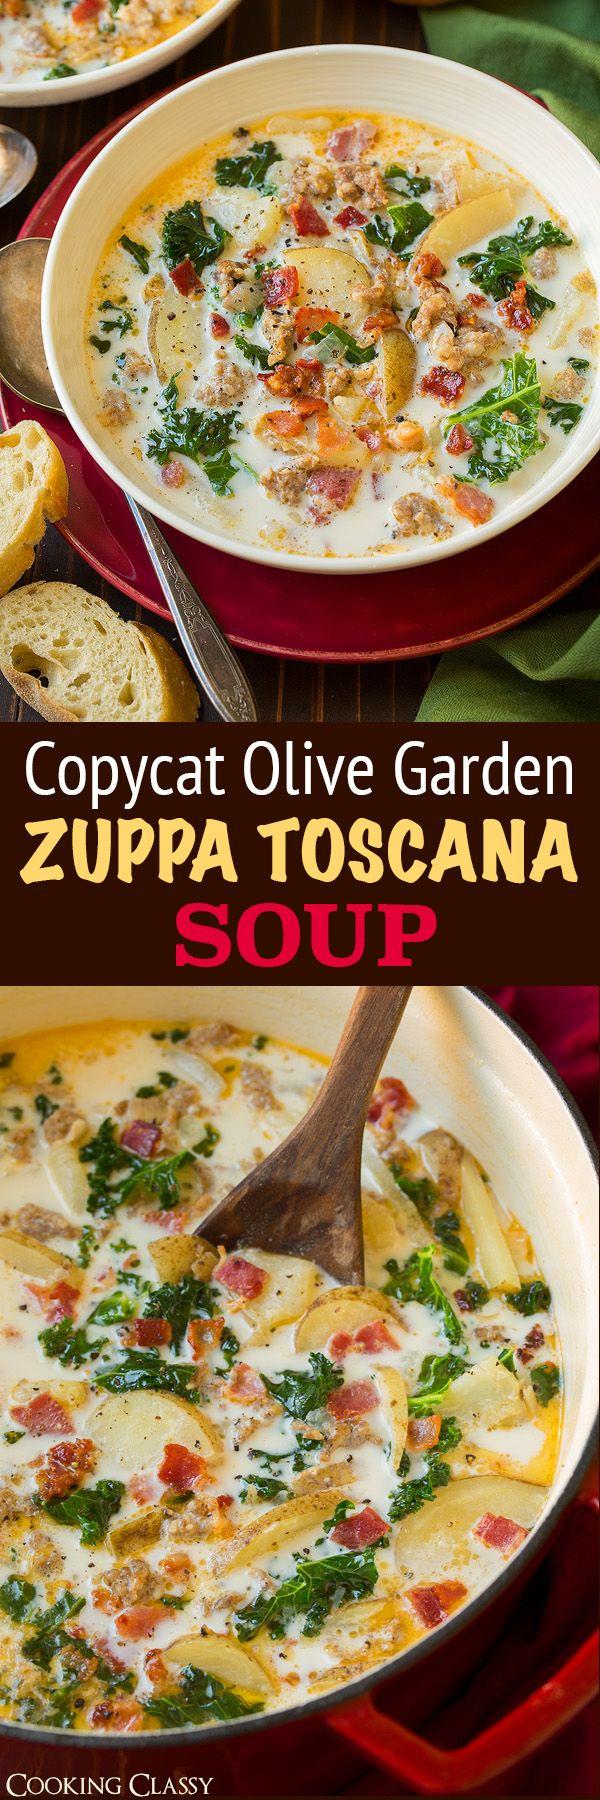 Zuppa Toscana Soup (Olive Garden Copycat) | Zuppa toscana soup ...